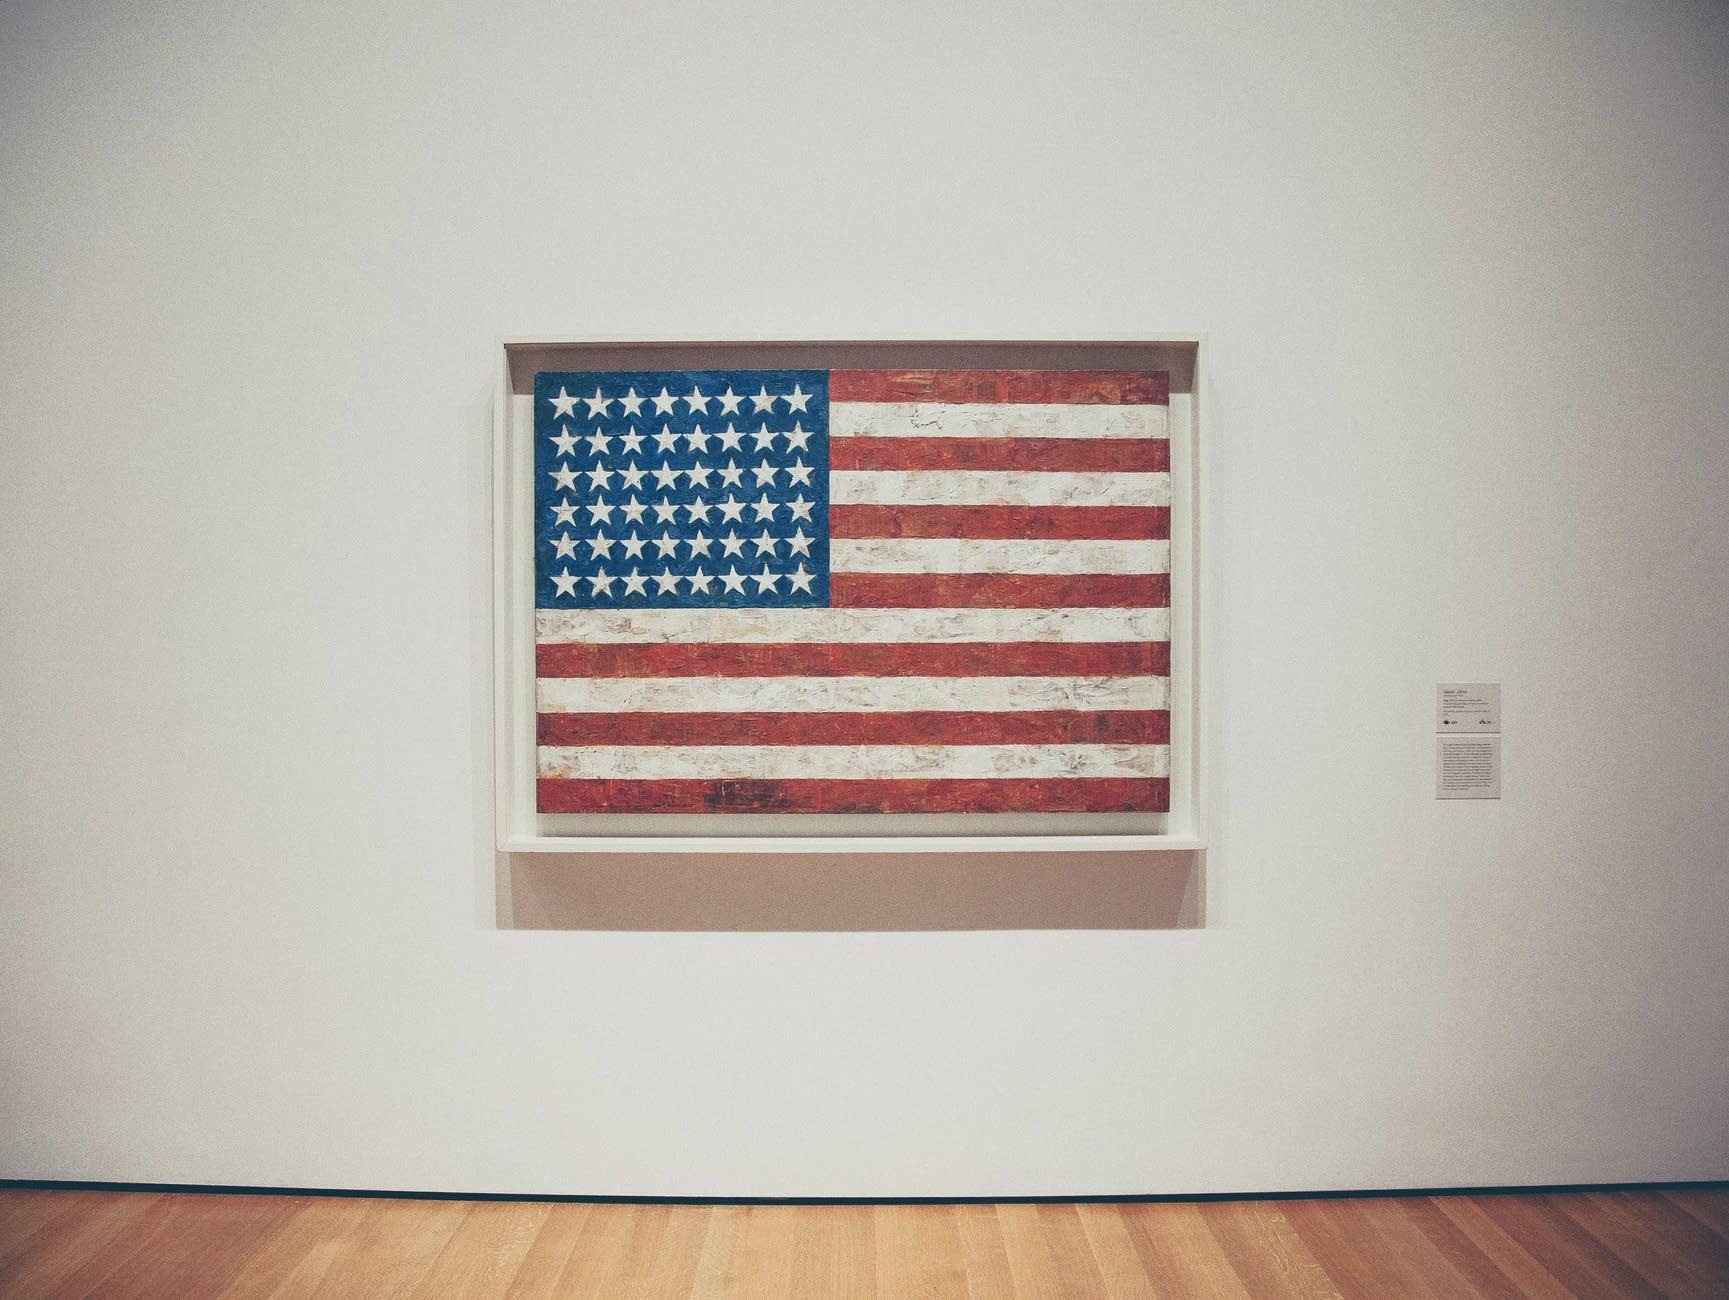 An American flag by artist Jasper Johns.